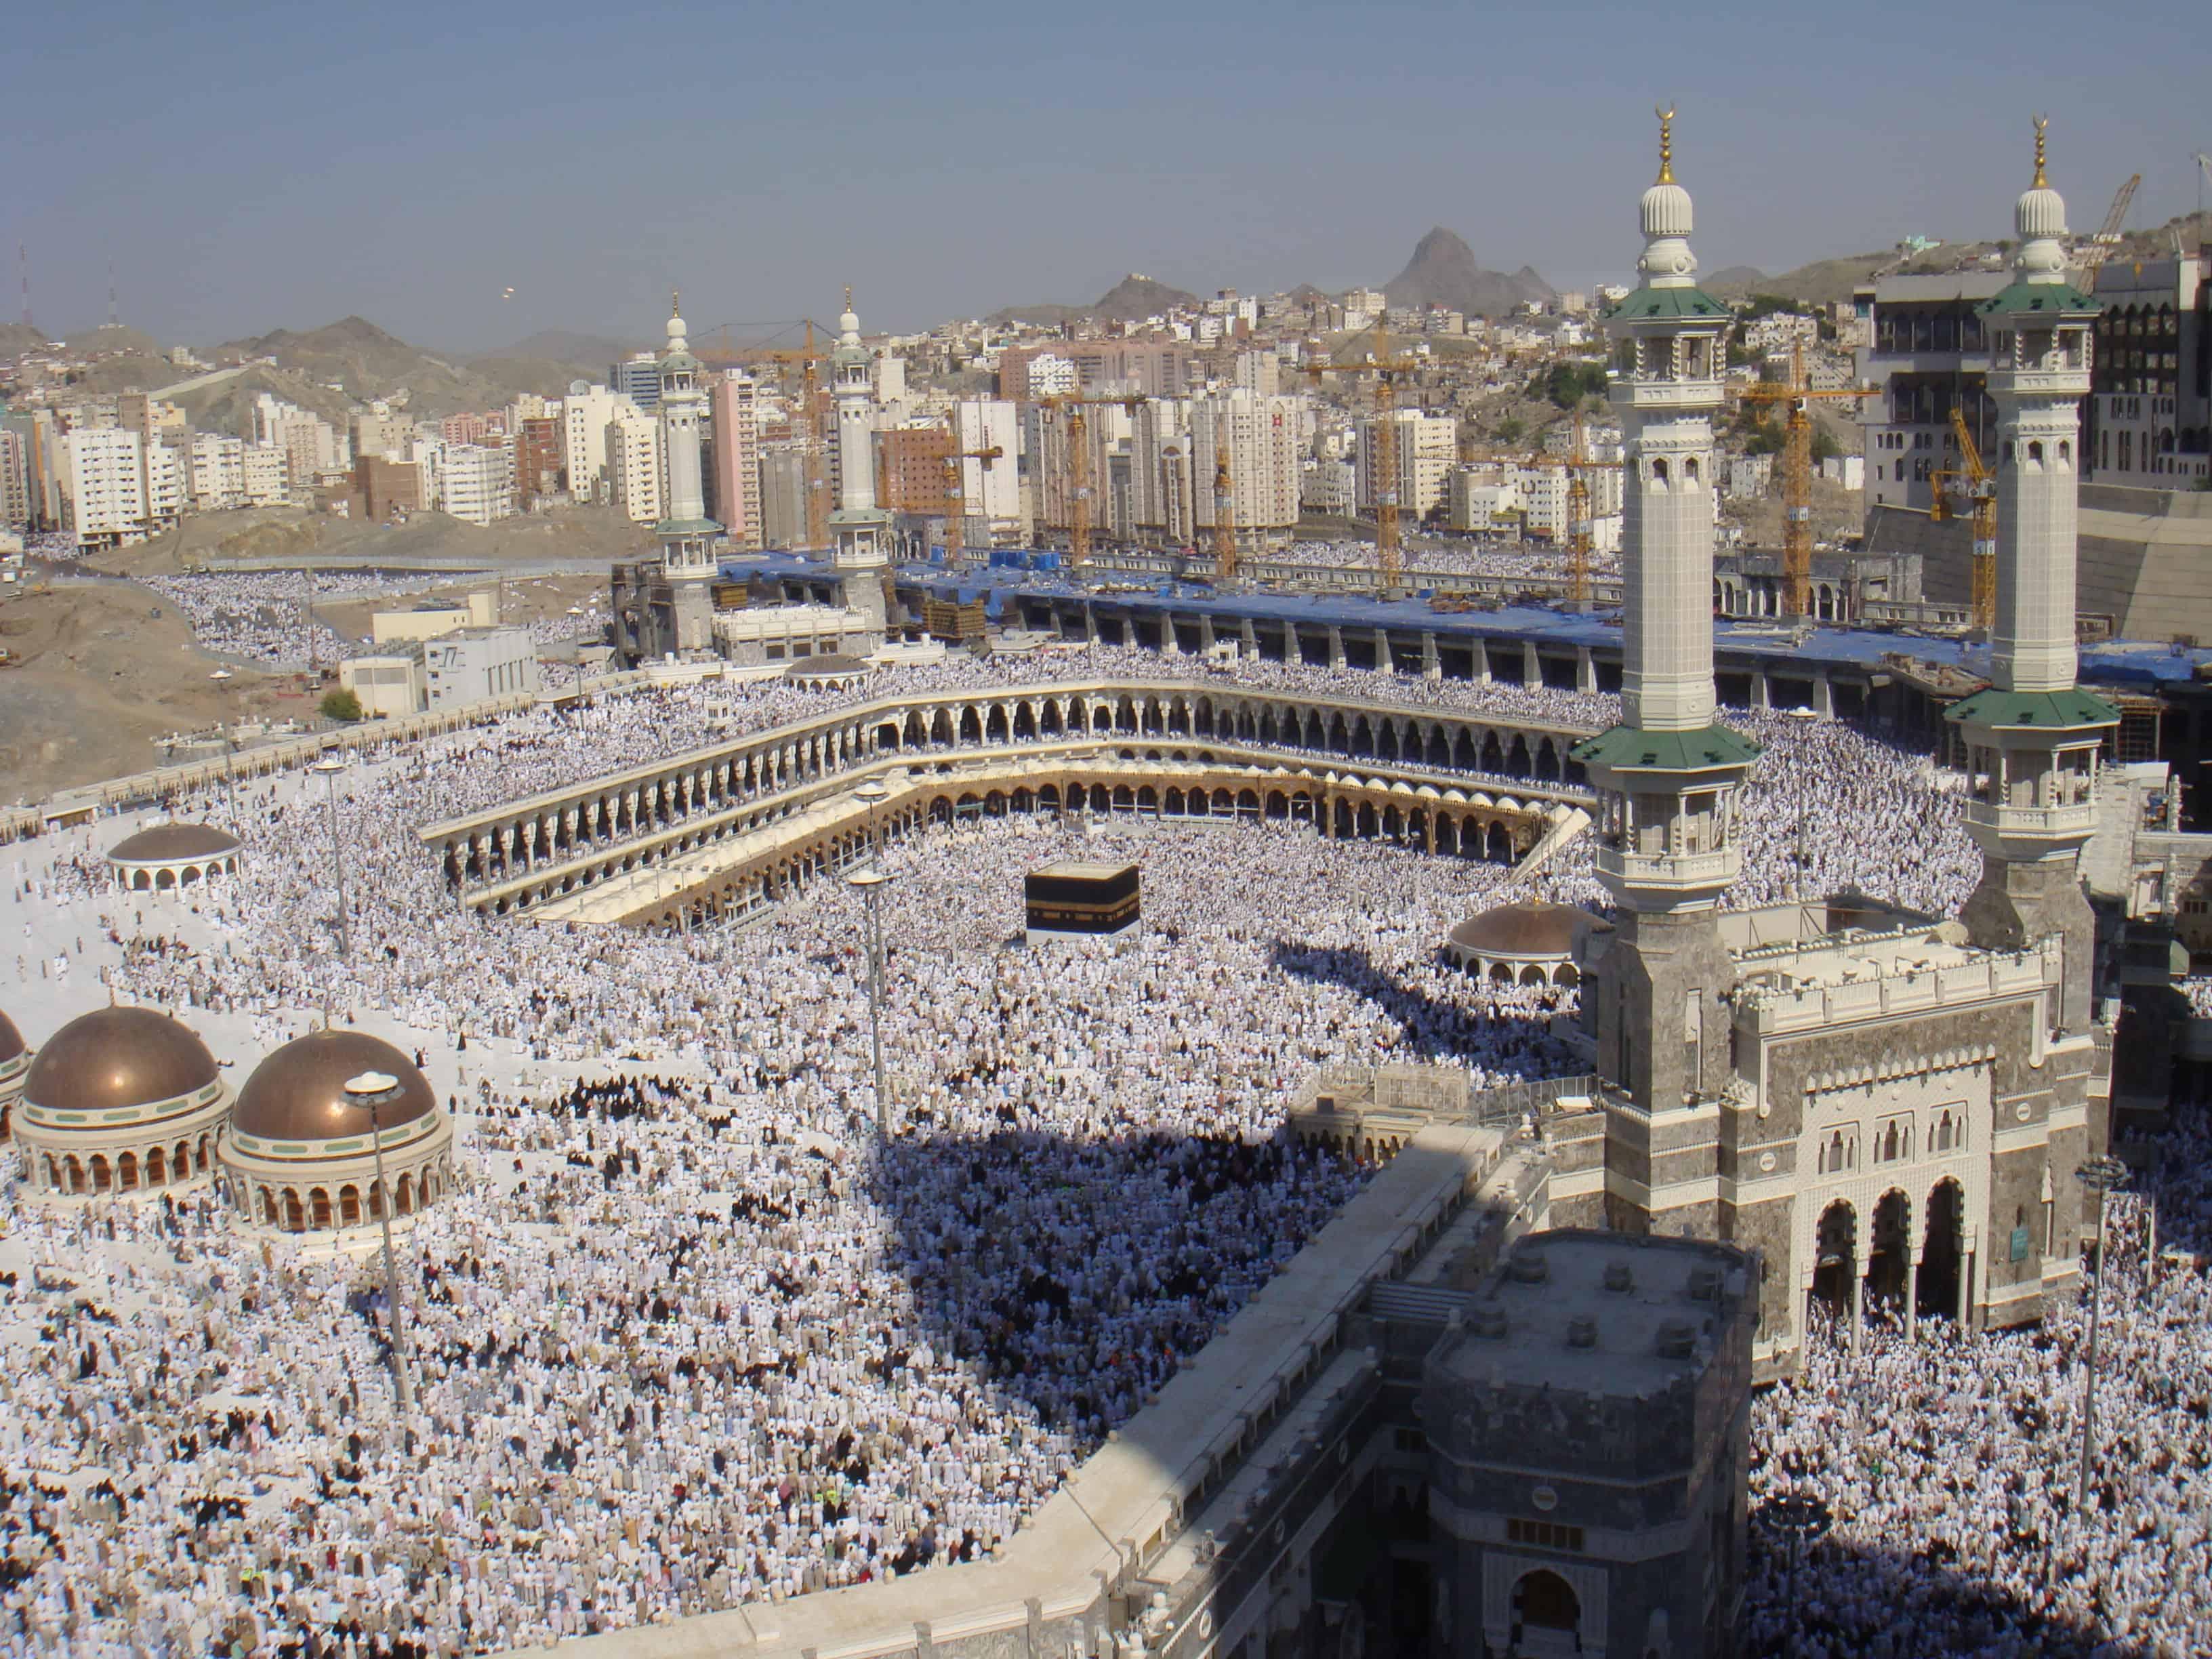 Al-Haram_mosque_-_Flickr_-_Al_Jazeera_English